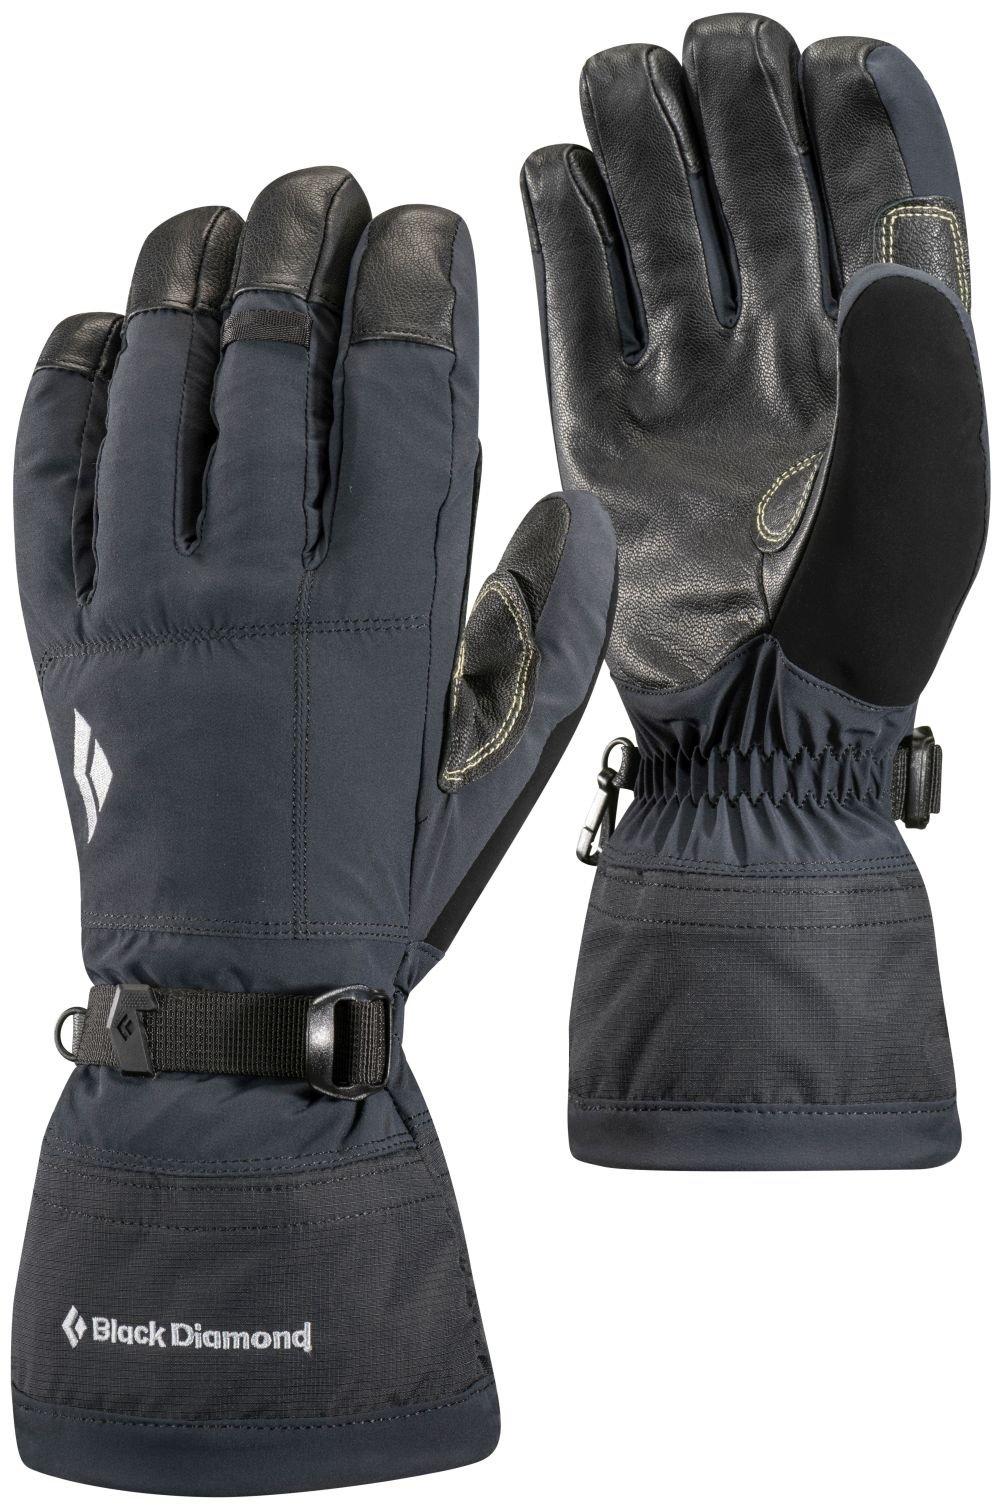 Black Diamond Soloist Cold Weather Gloves, Black, Medium by Black Diamond